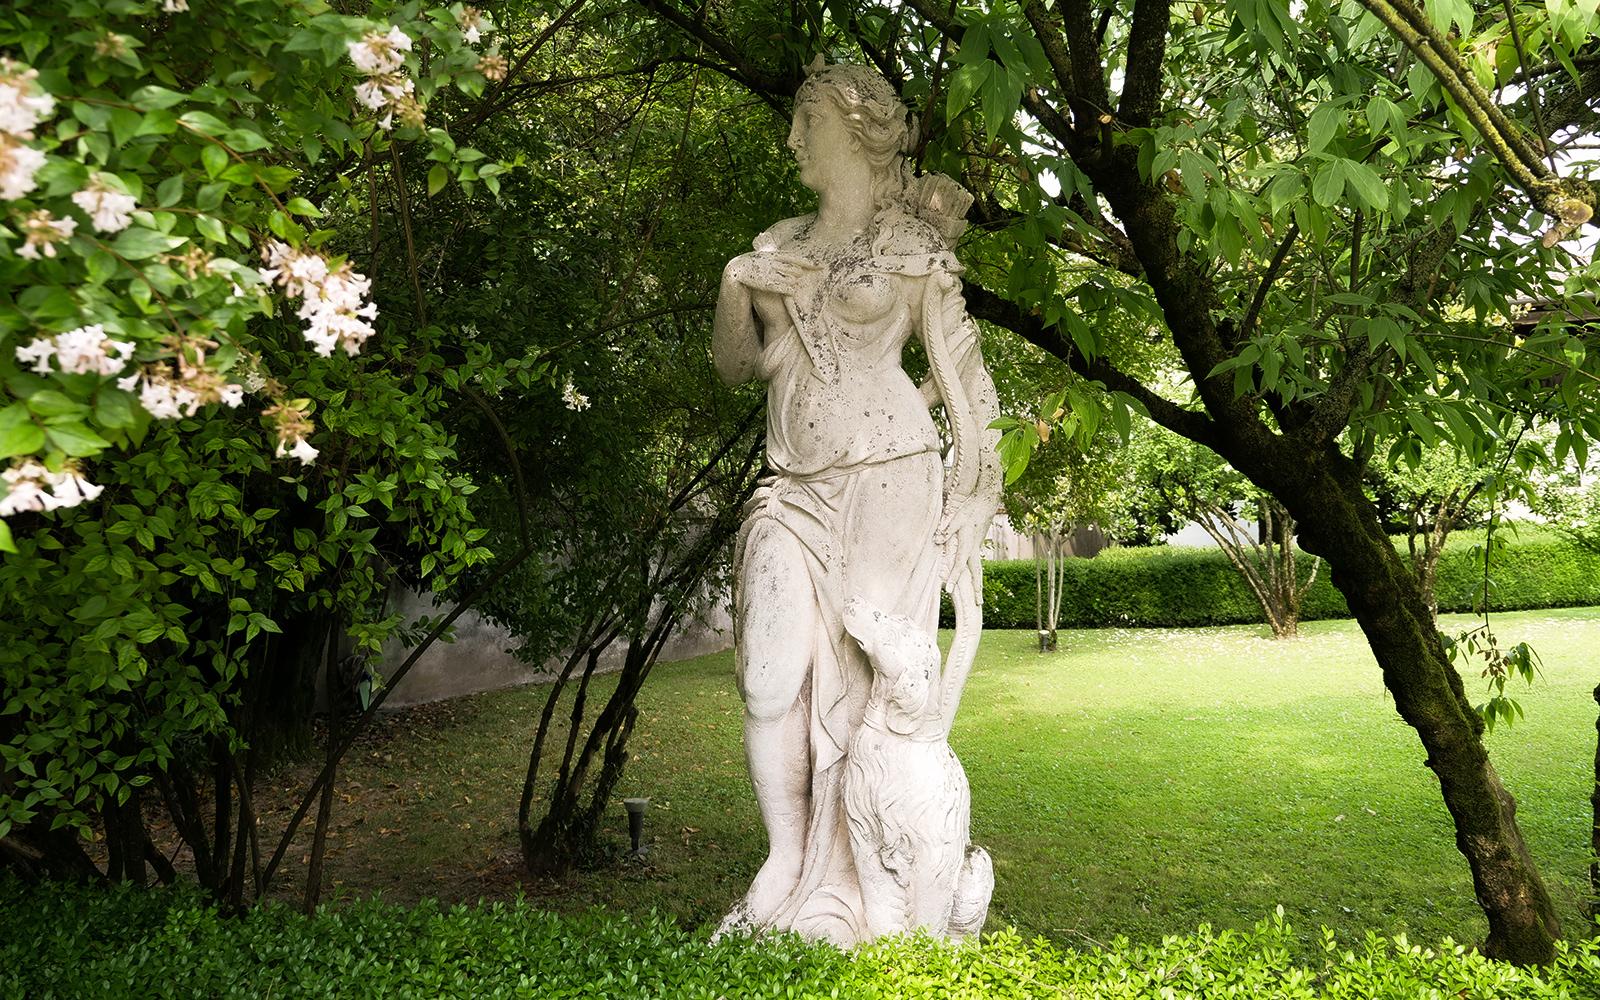 location matrimonio Vicenza, parco per matrimonio Vicenza, villa matrimoni Vicenza